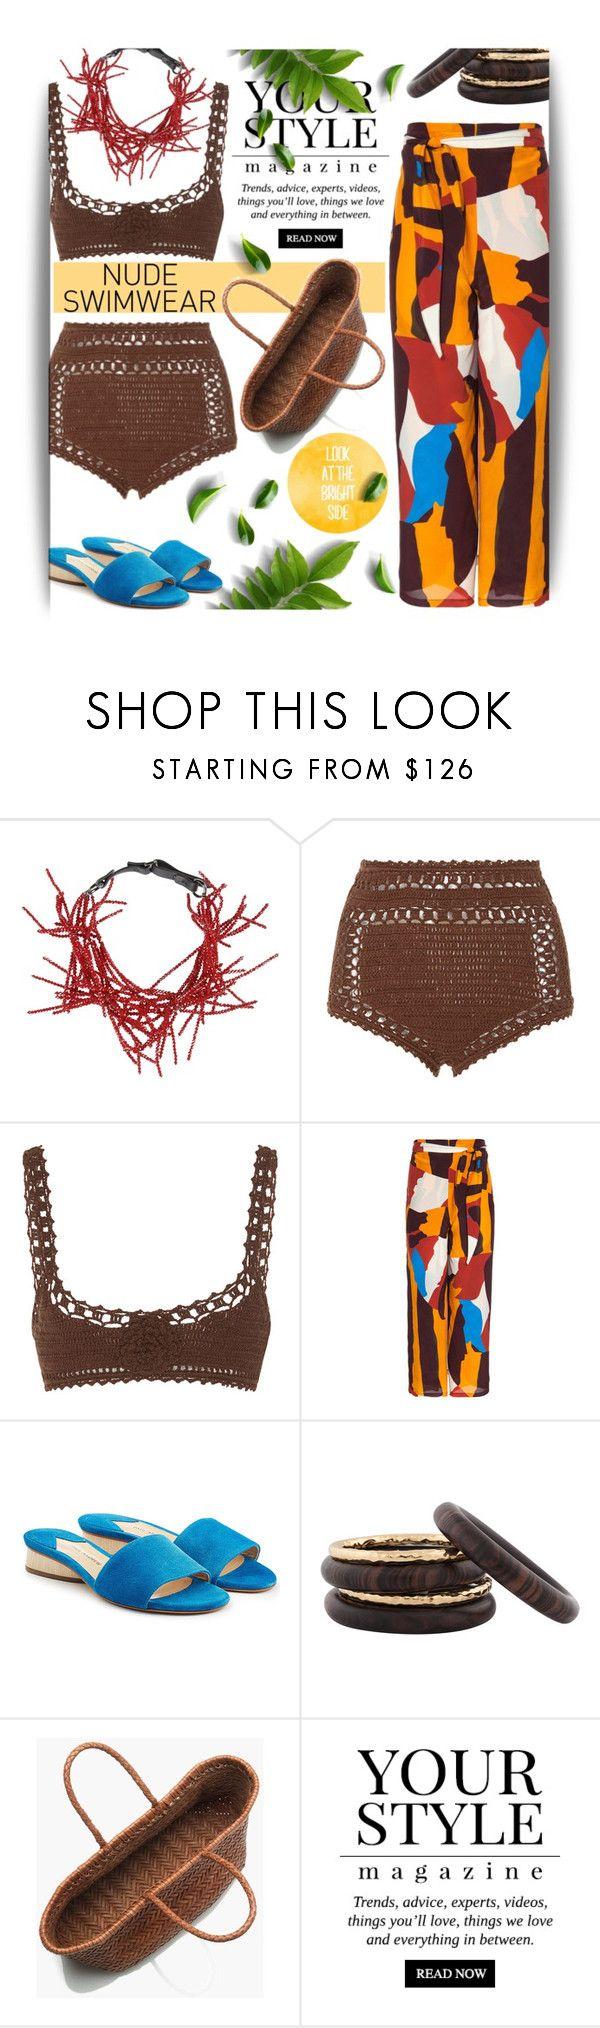 """nude swimwear"" by maranella ❤ liked on Polyvore featuring Brunello Cucinelli, SHE MADE ME, Paul Andrew, Nest, J.Crew, Pussycat, crochetbikini and nudeswimwear"